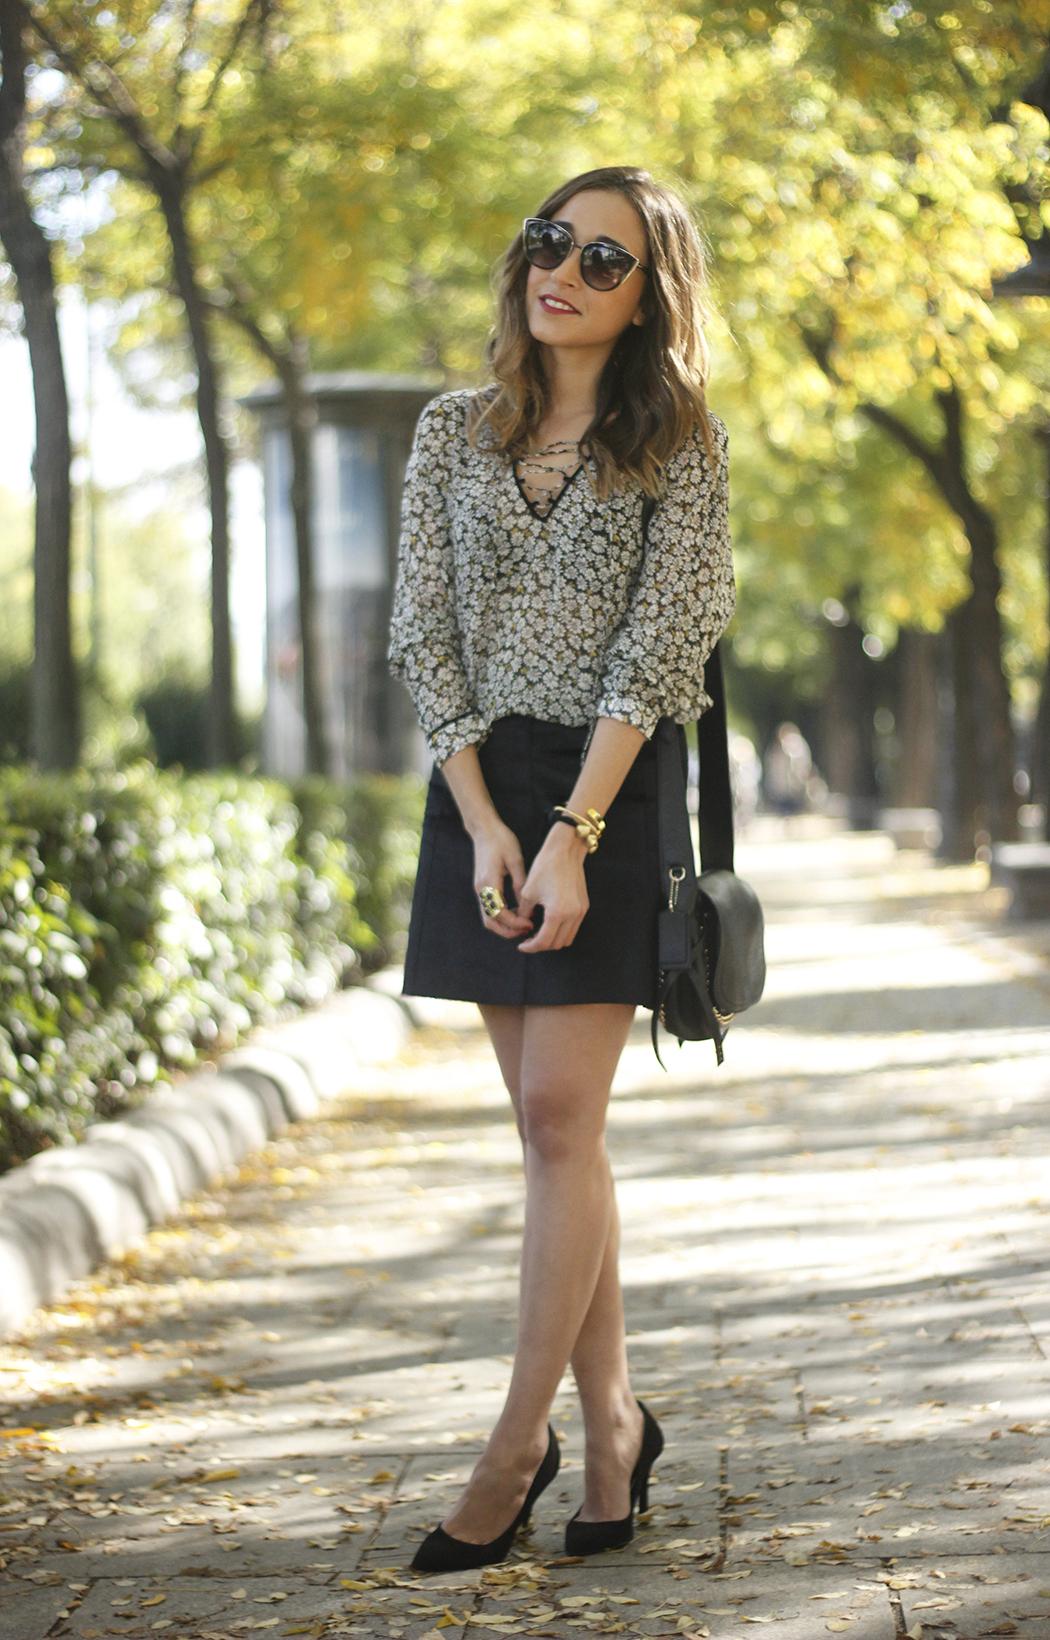 Daisy shirt with black shirt06